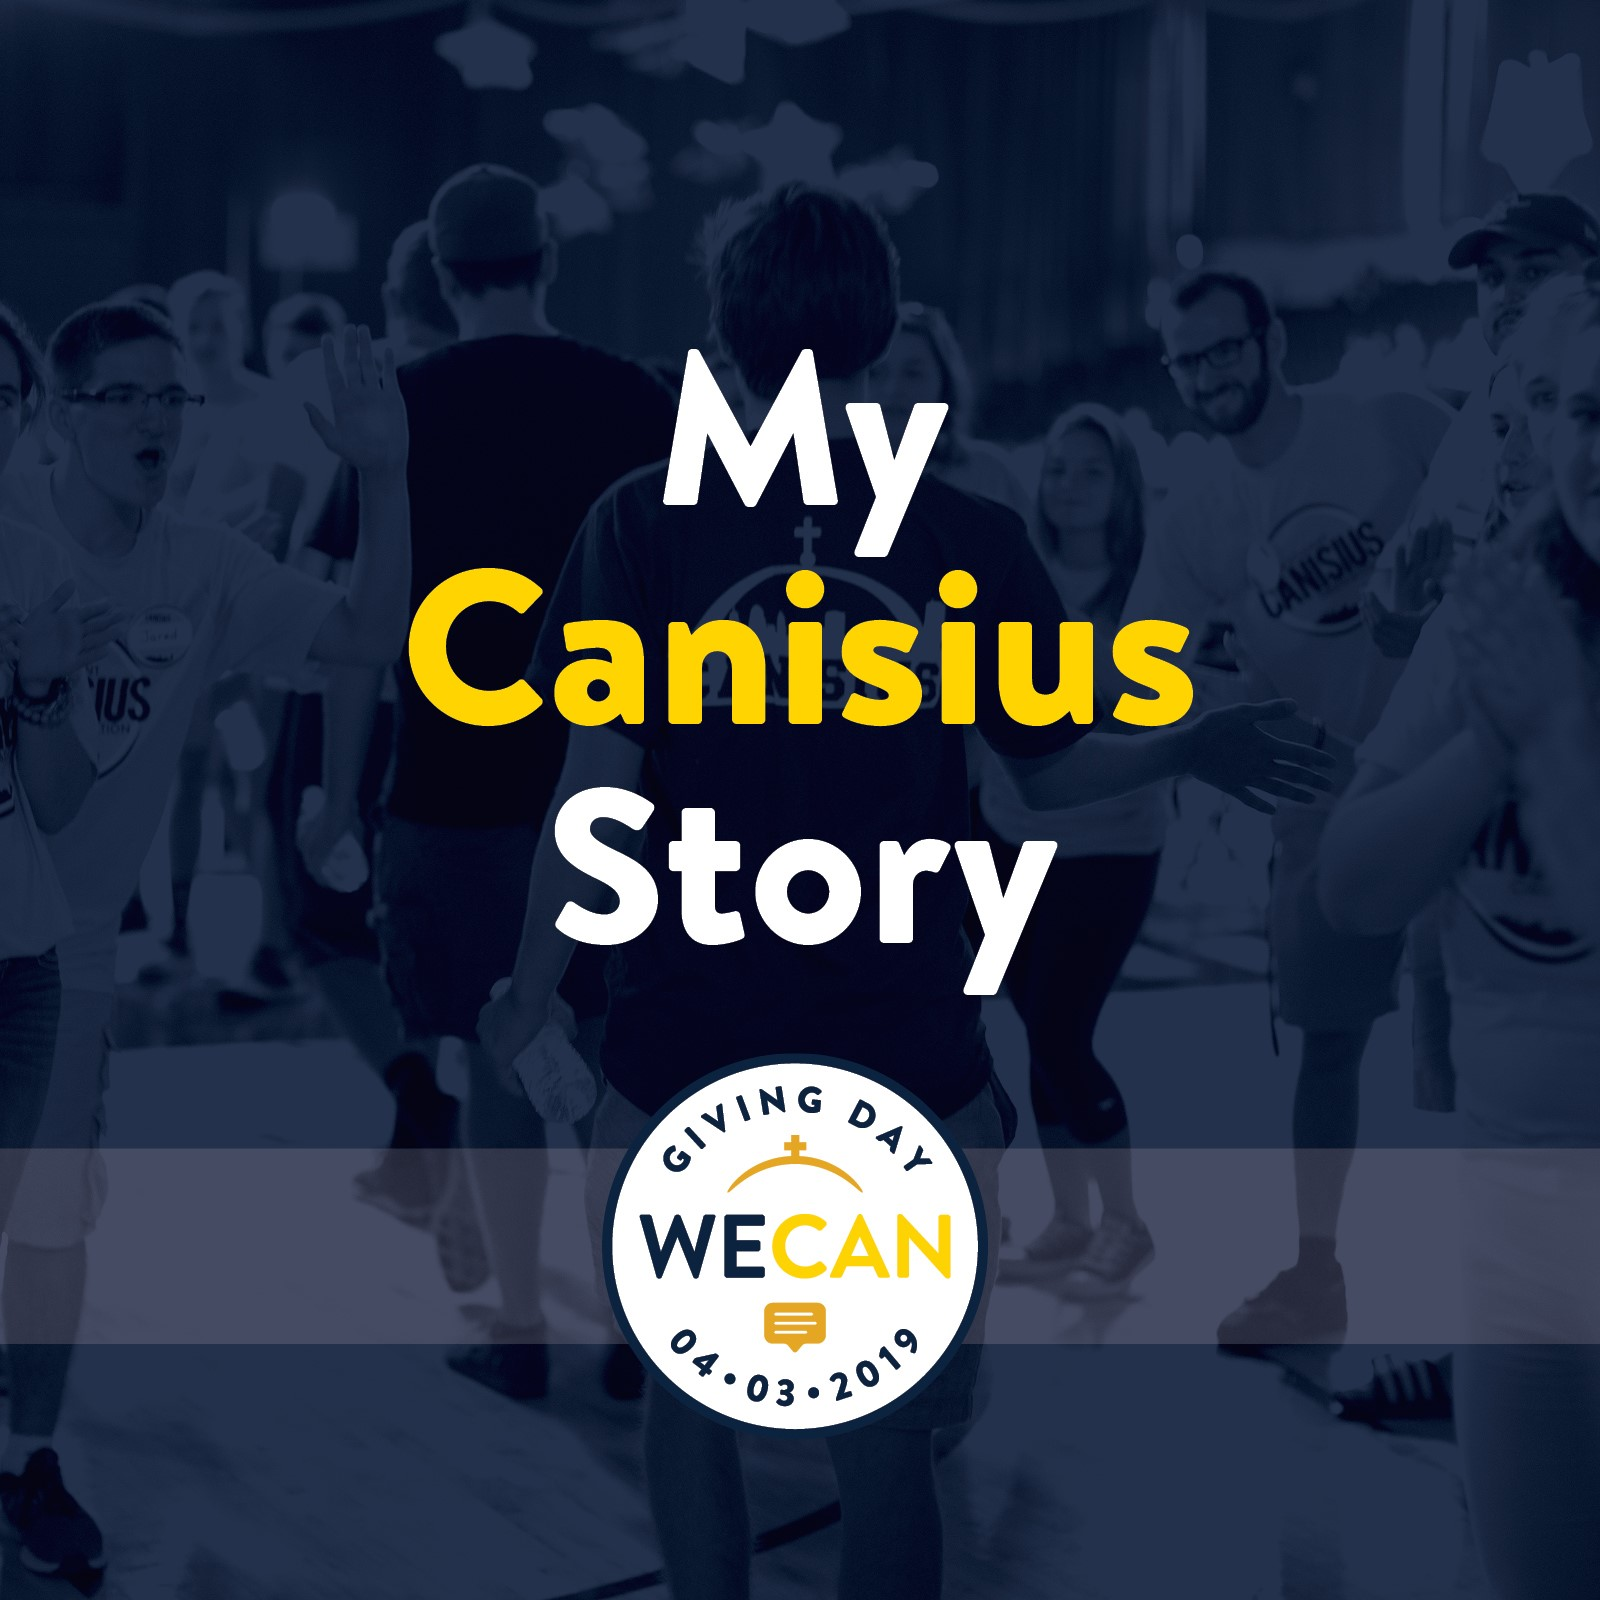 MyCanisiusStory.jpg